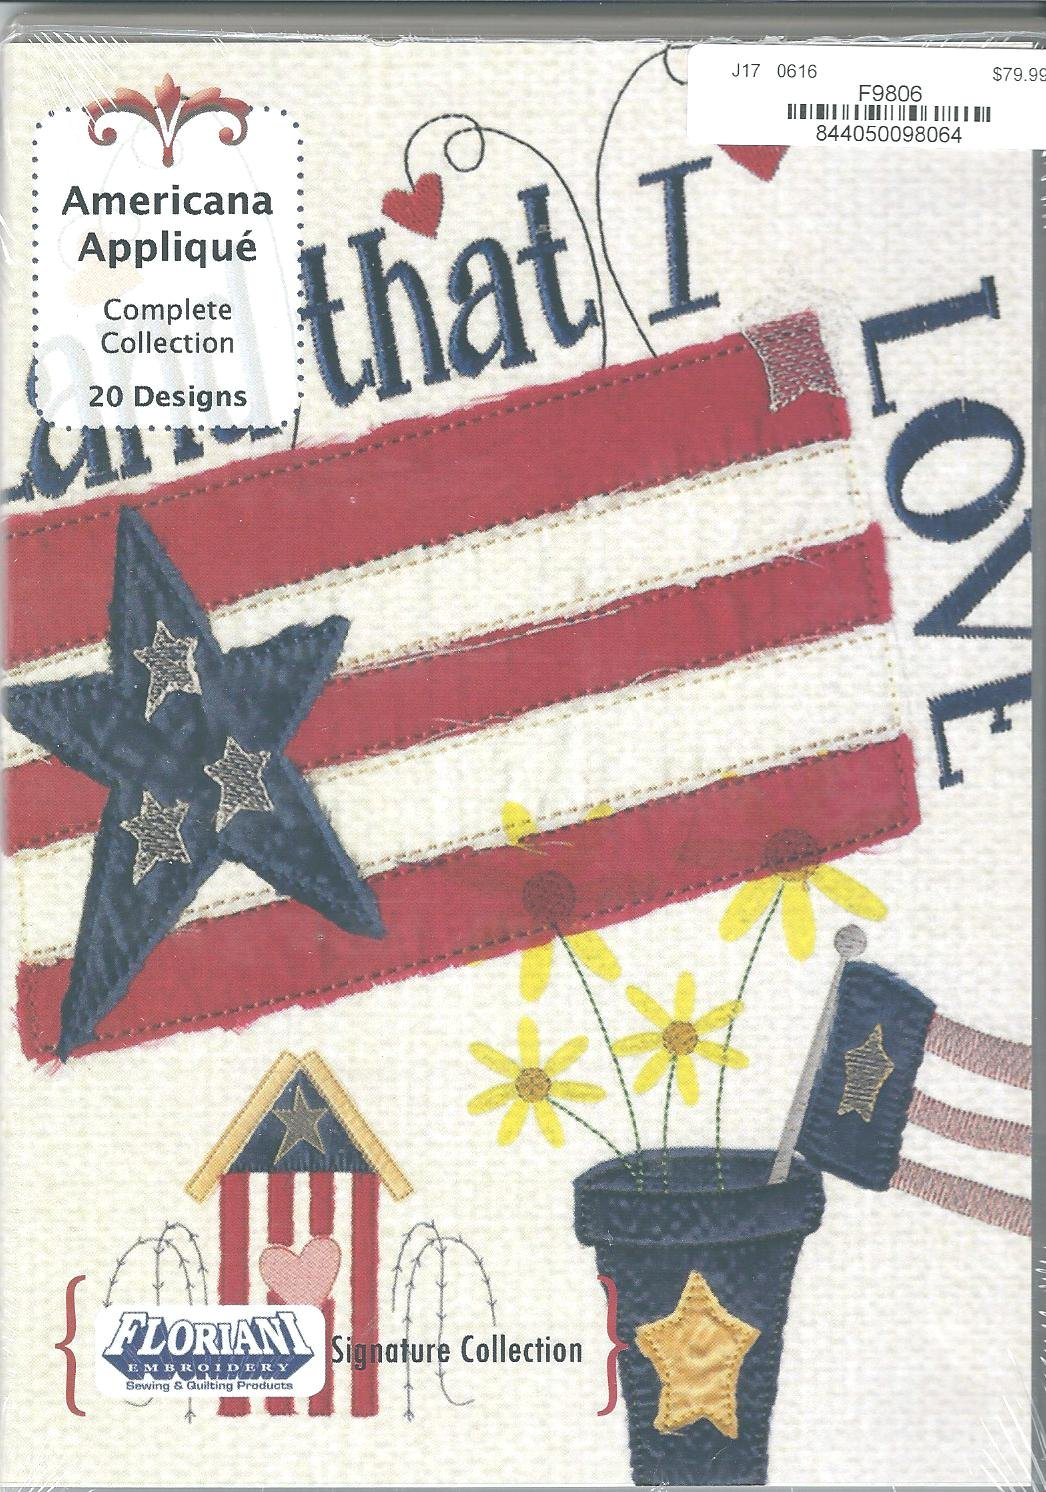 Floriani Embroidery Design Collection Americana Applique